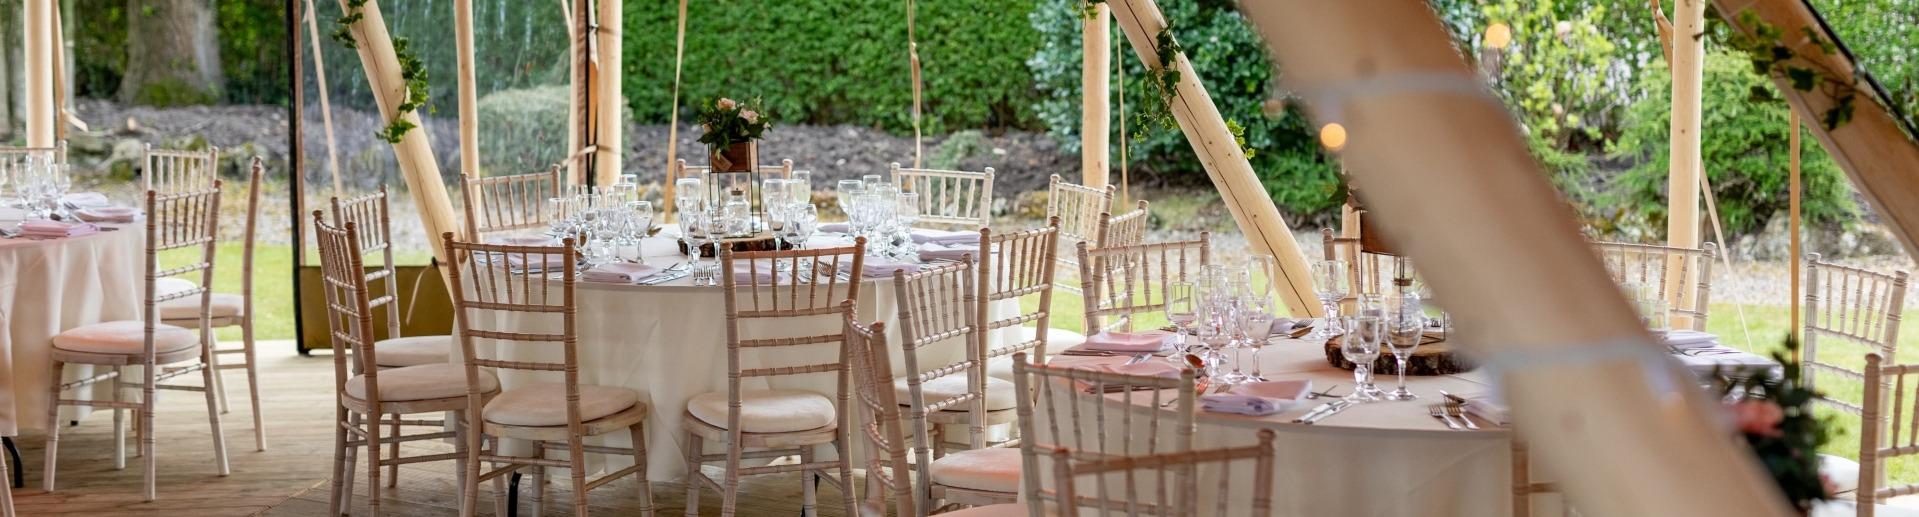 cedar Court Harrogate wedding tipi